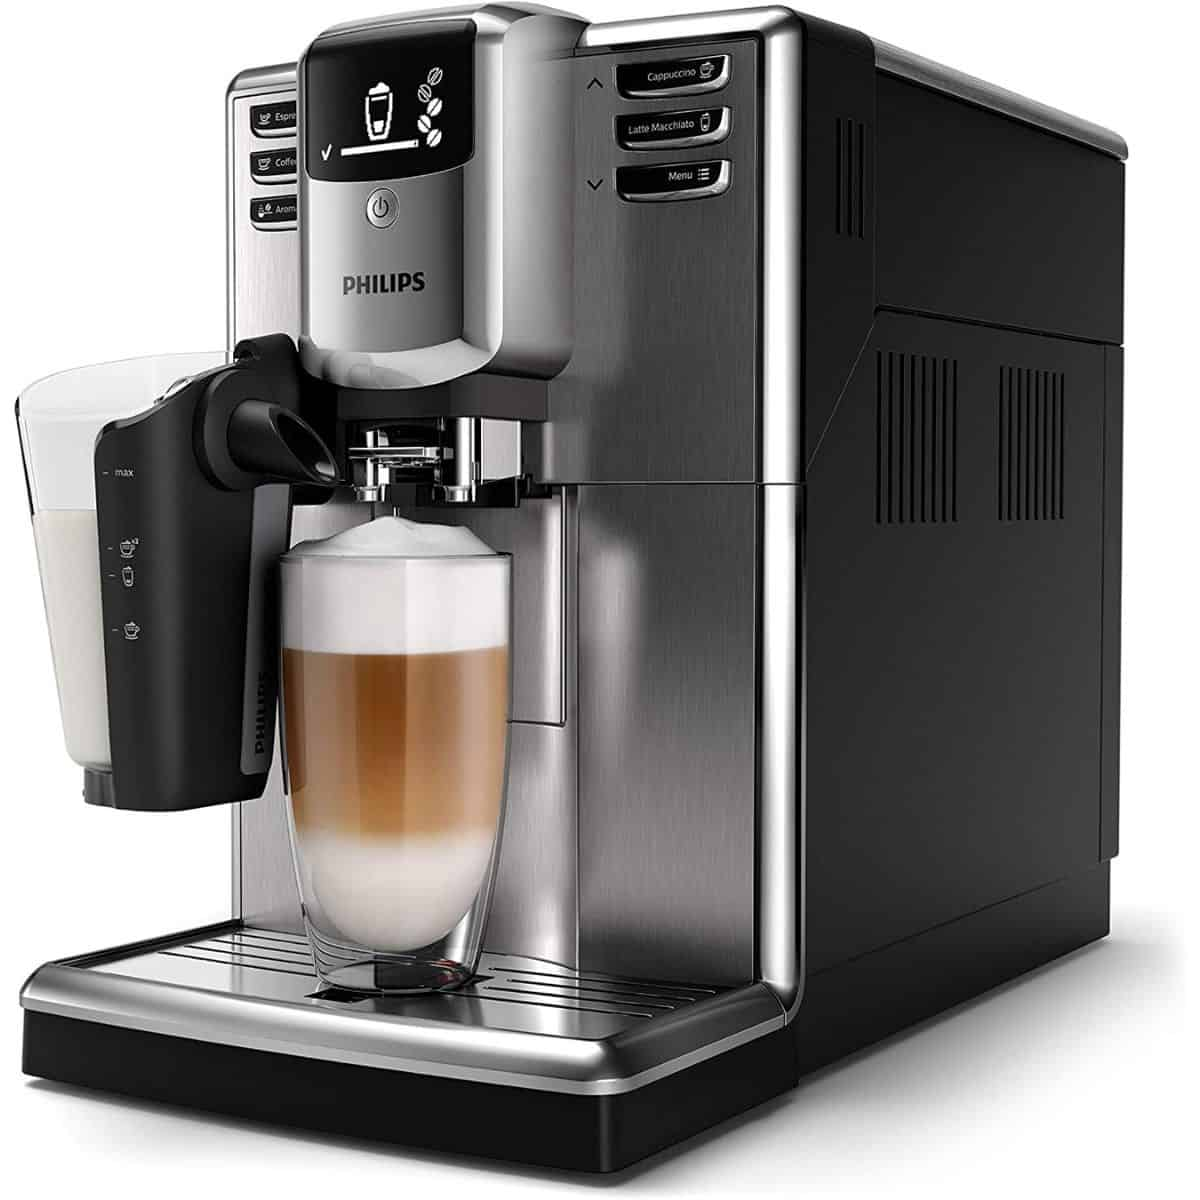 Philips Serie 5000 EP5330/10 Kaffeevollautomat